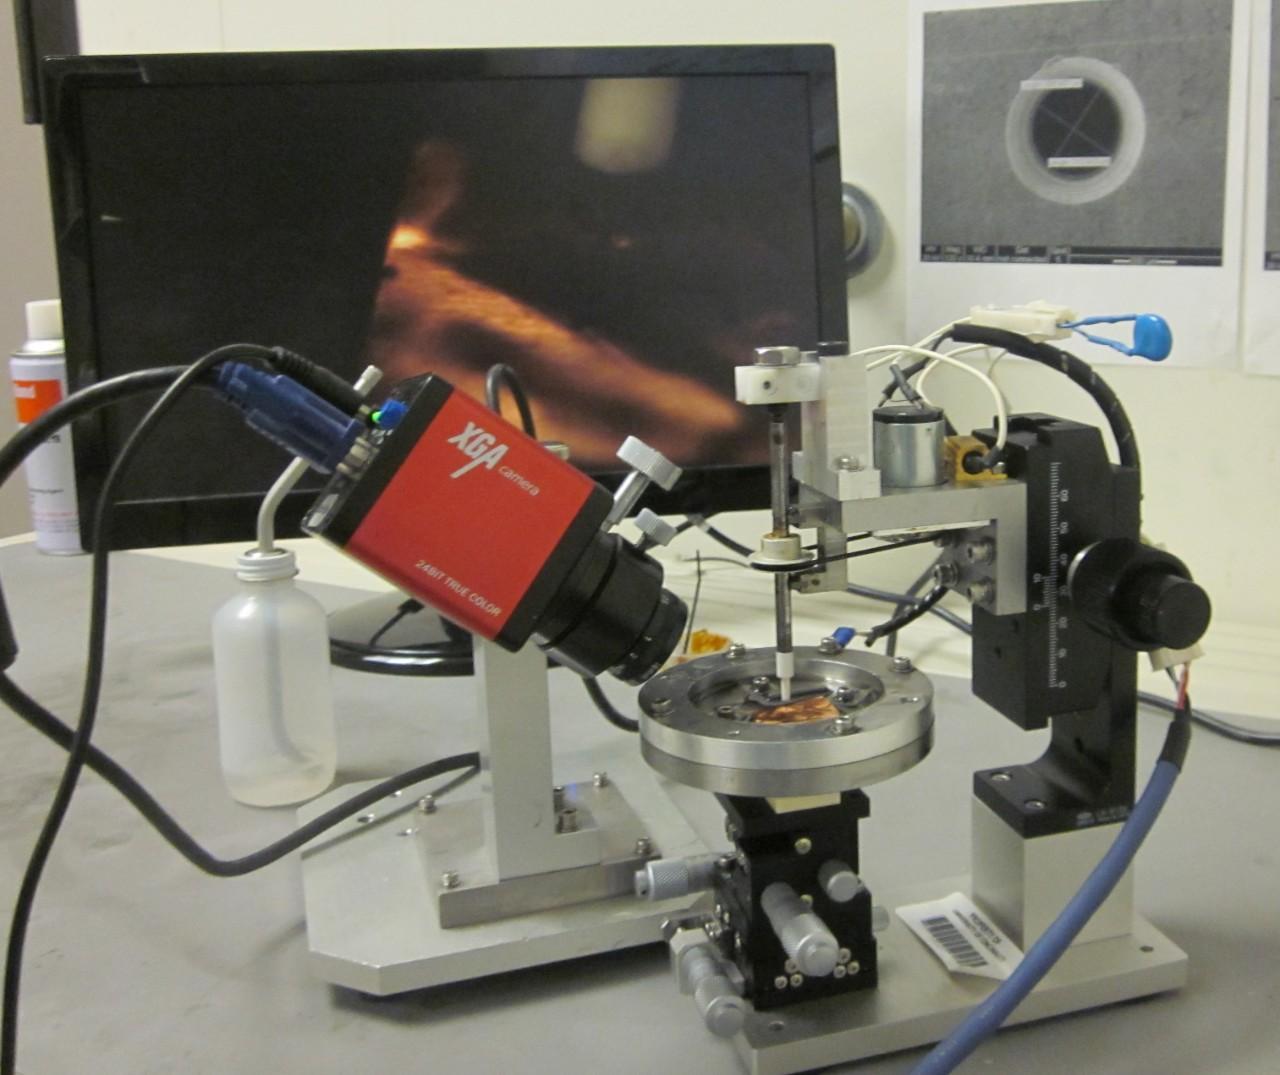 Piece of lab equipment